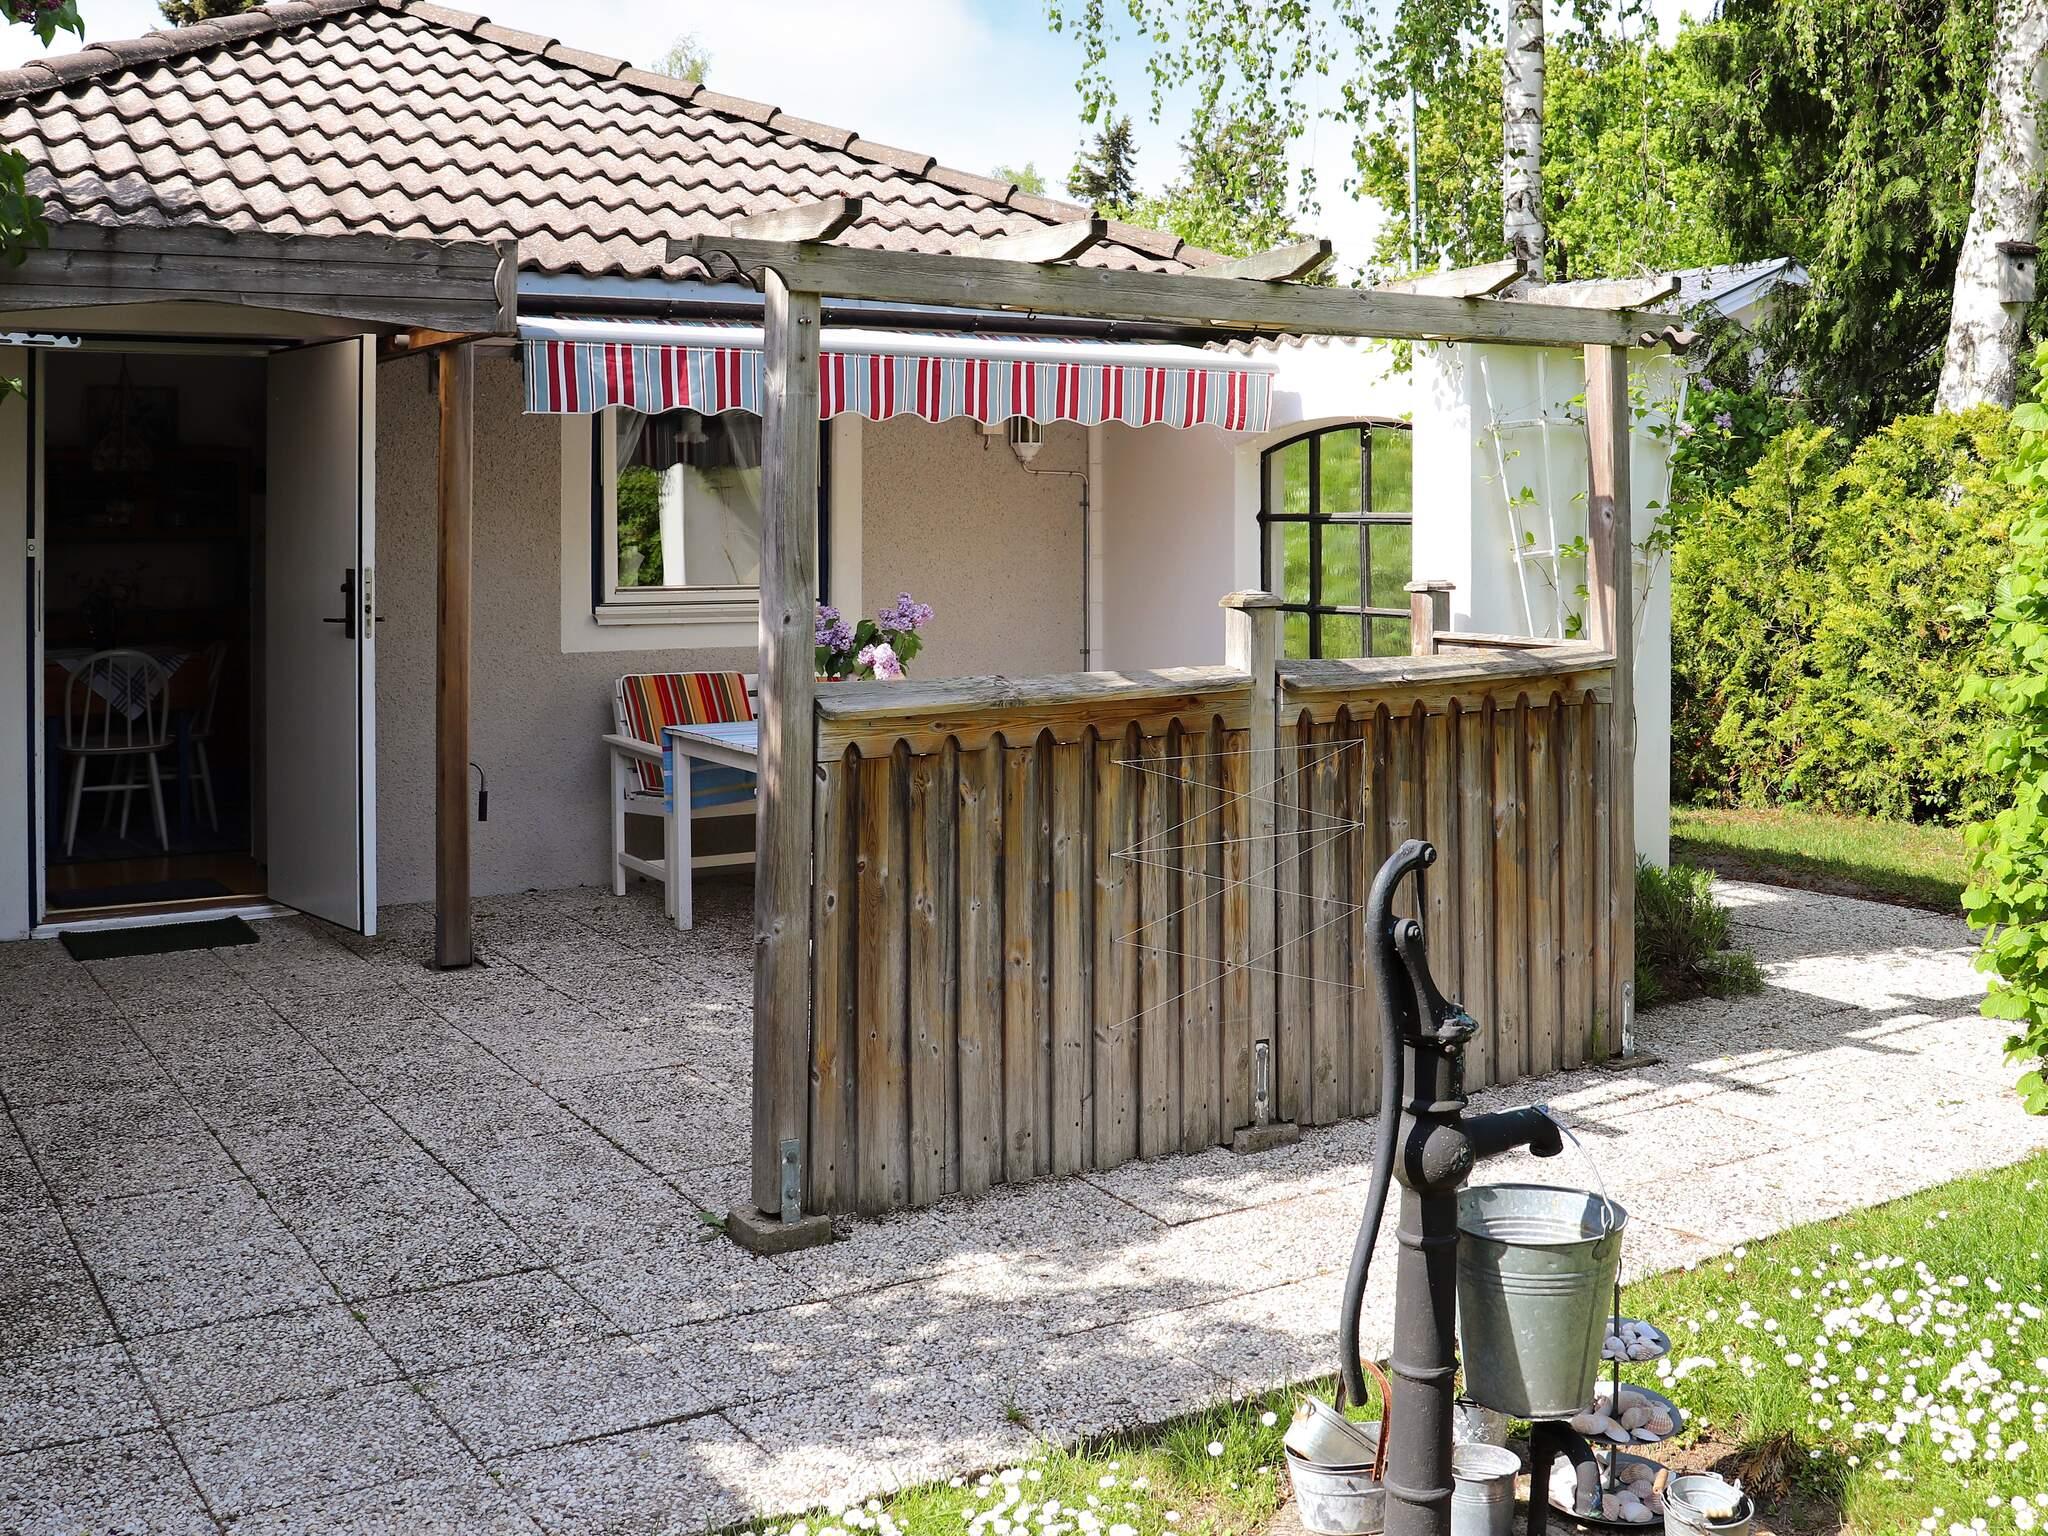 Ferienhaus Höllviken (2624334), Höllviken, Skane län, Südschweden, Schweden, Bild 11